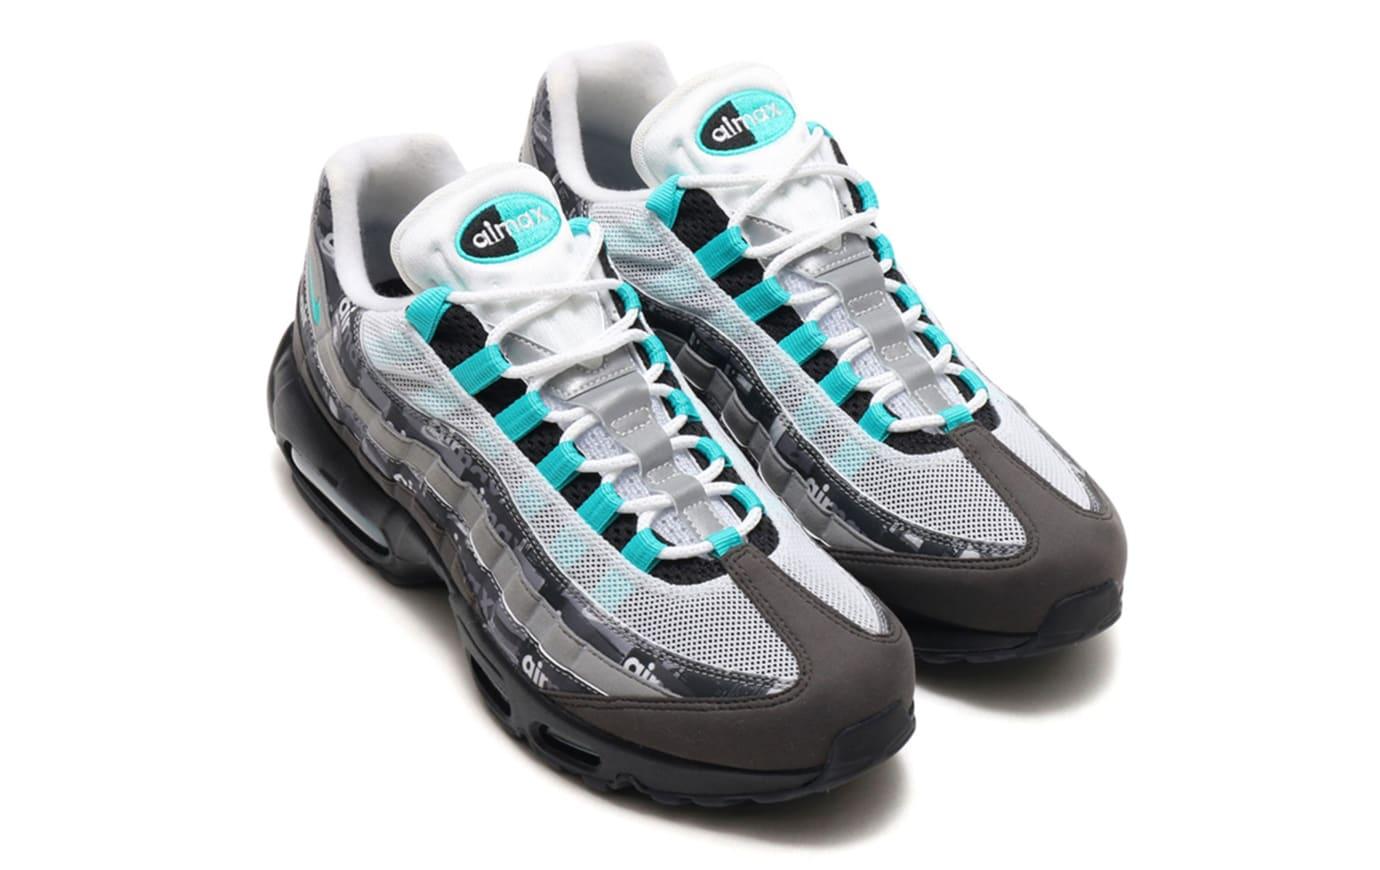 Atmos x Nike Air Max 95 'Jade/We Love Nike' (Pair)